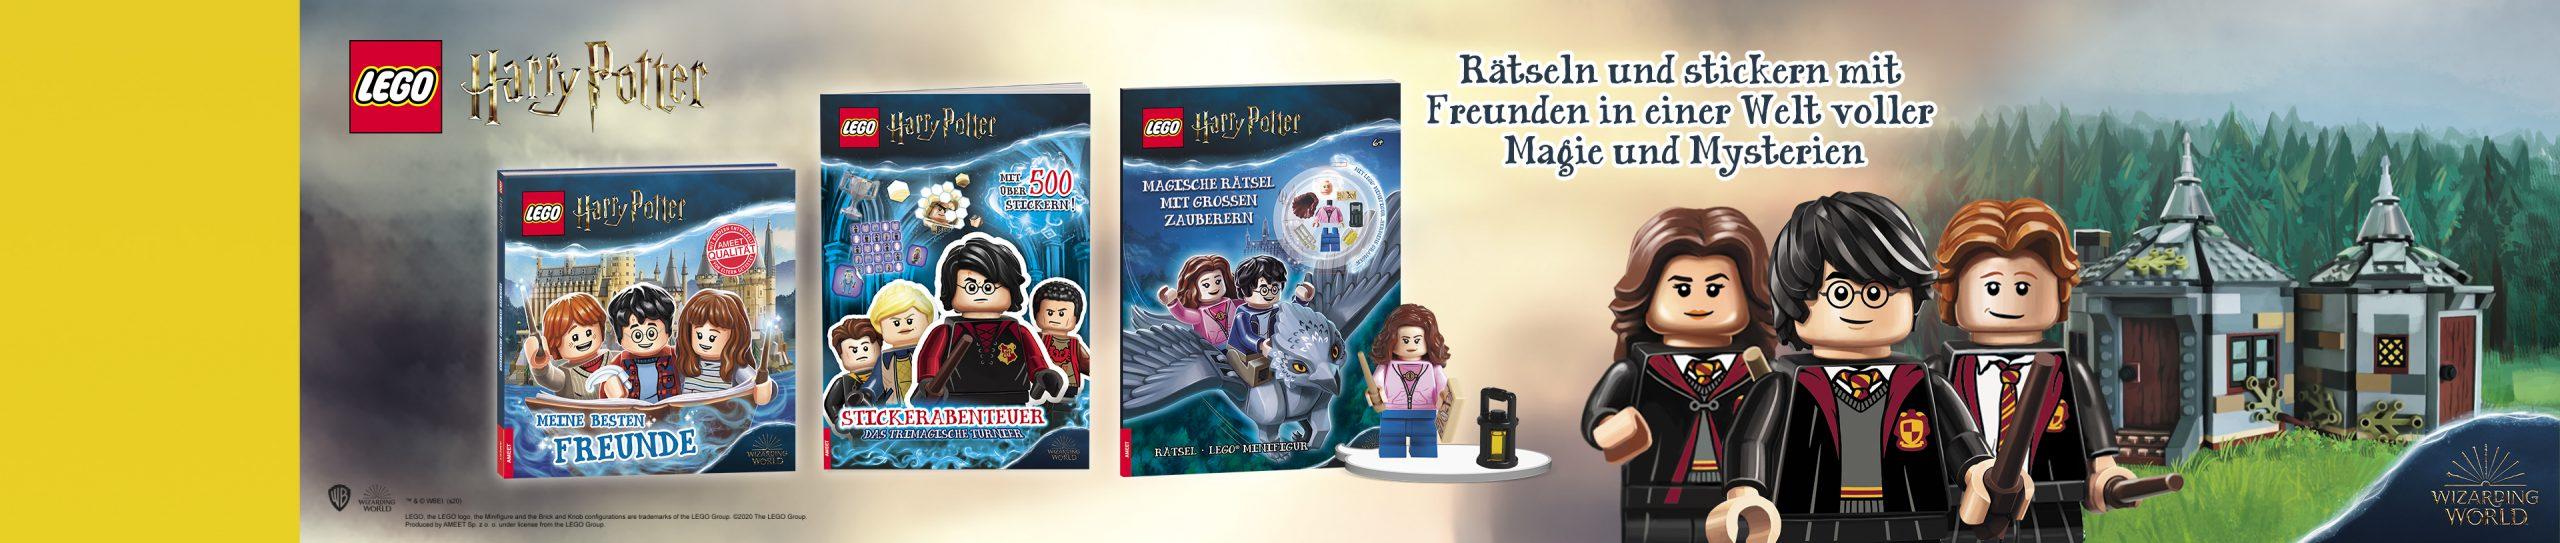 LEGO Harry Potter Neue Bücher